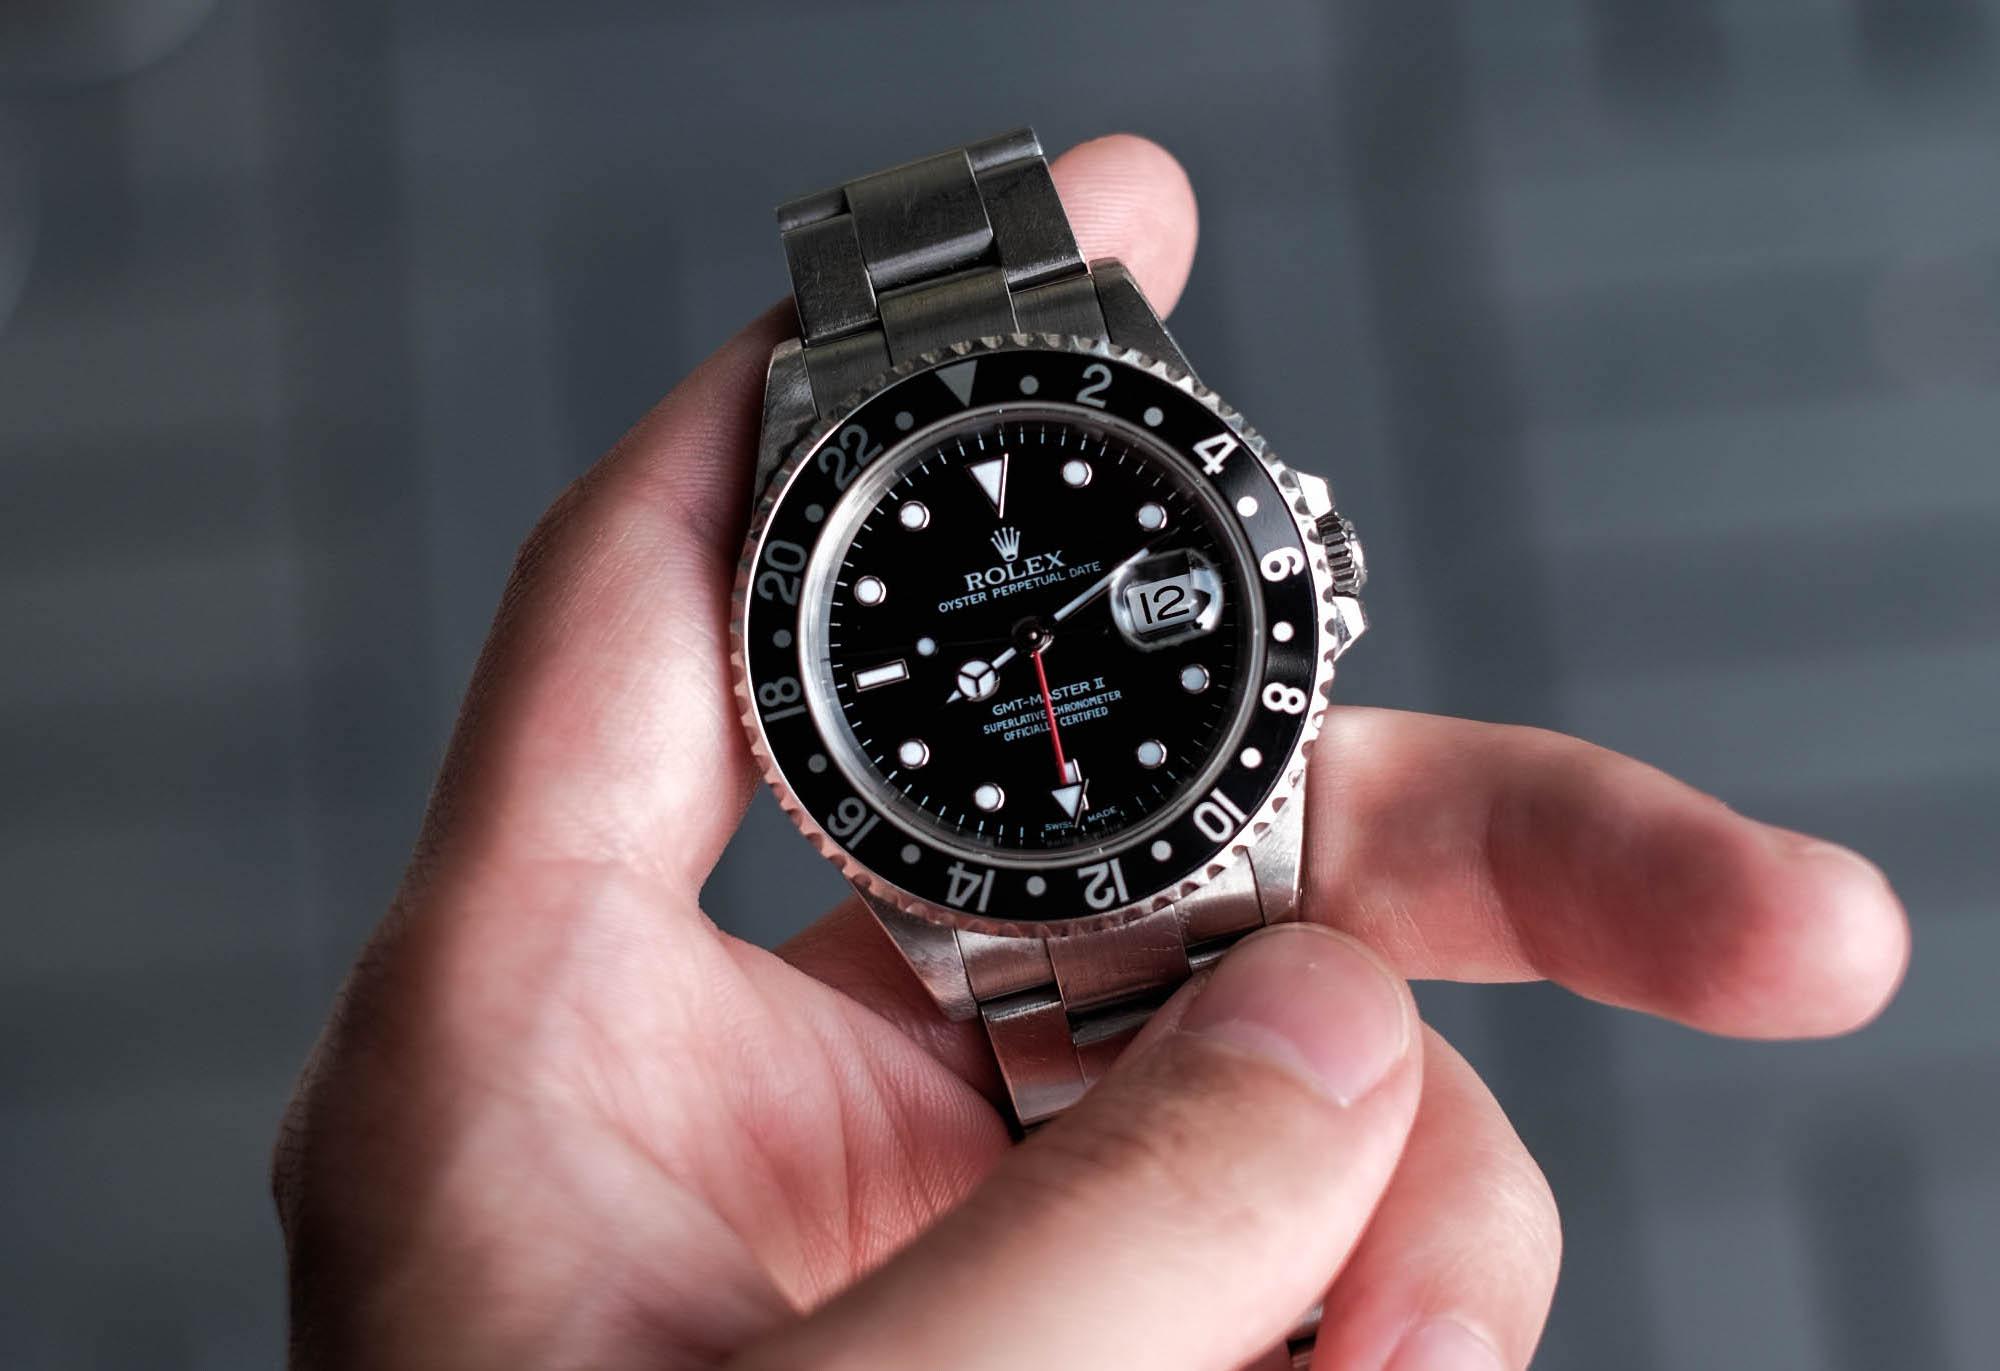 Rolex GMT Master II Ref. 16710 Review